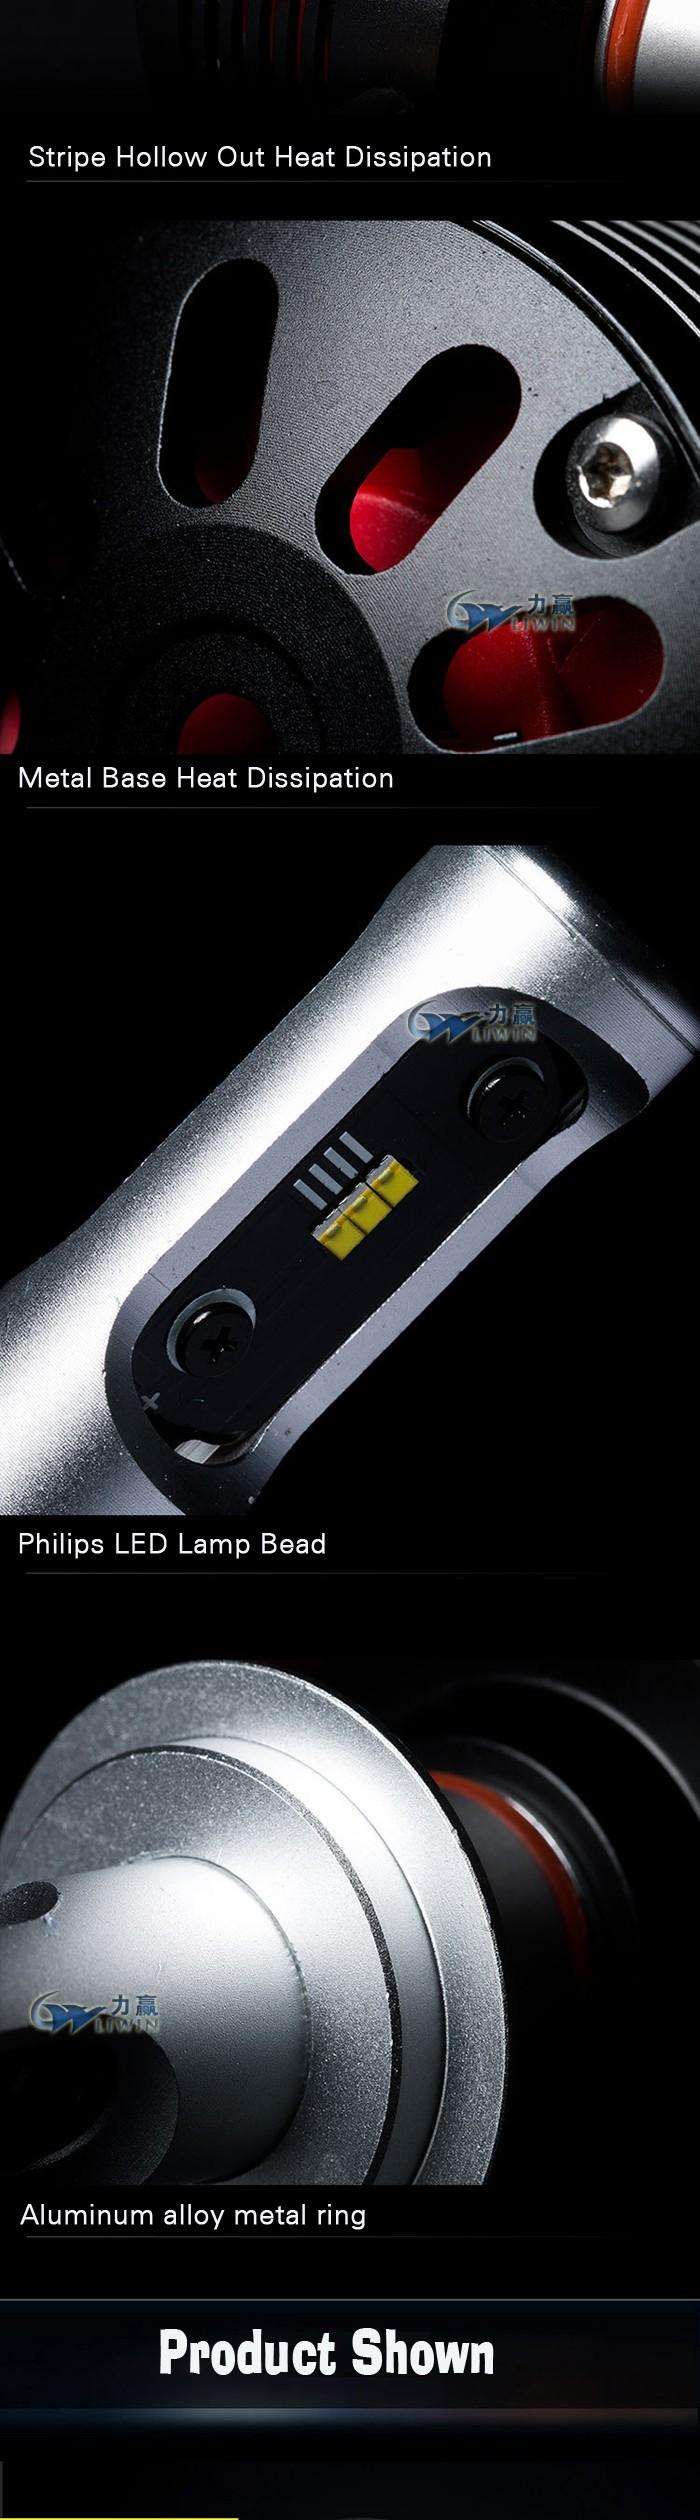 led headlight-3.jpg